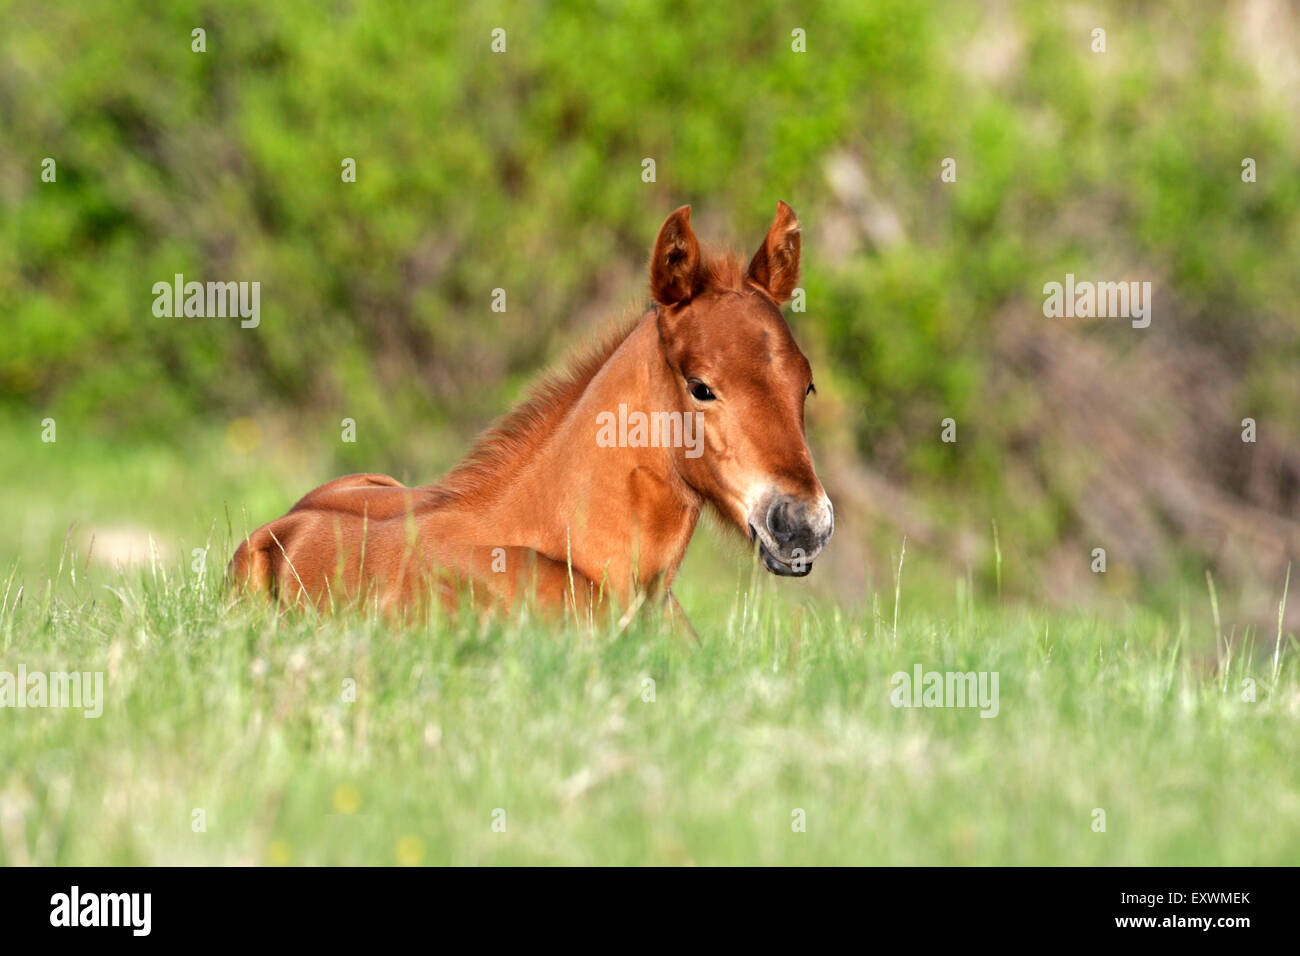 Quarterhorse Fohlen resting in spring meadow - Stock Image